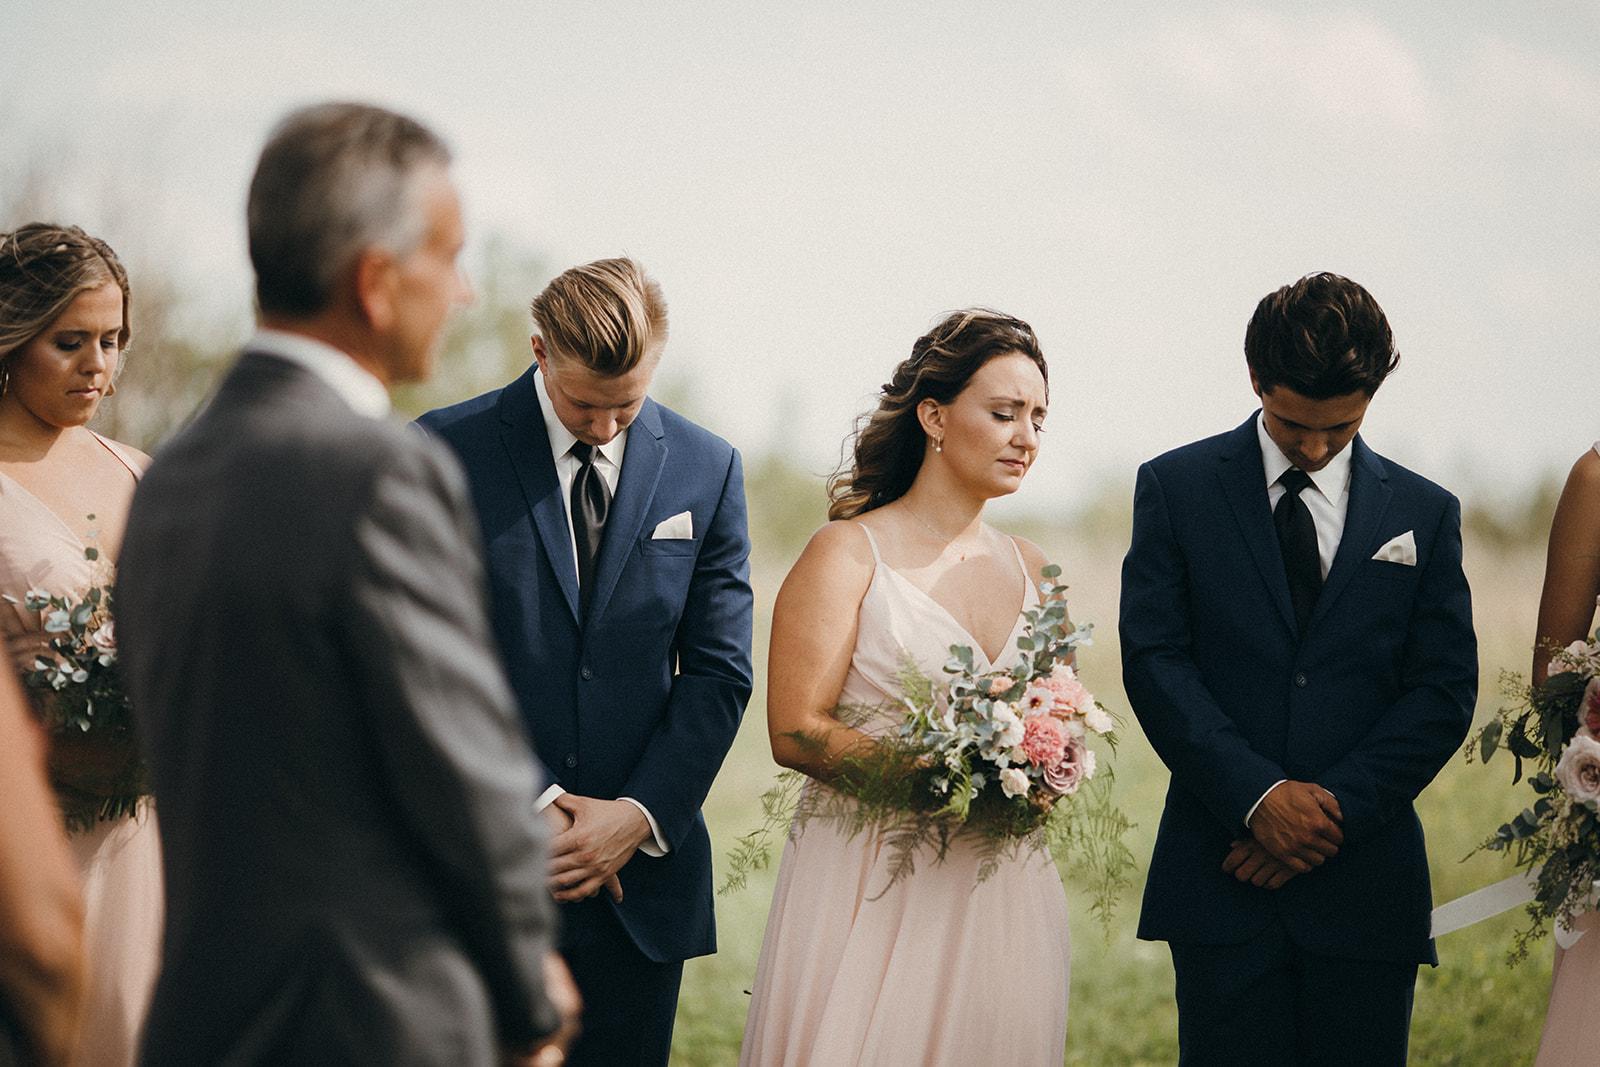 kaden_justine_wedding_3770.jpg